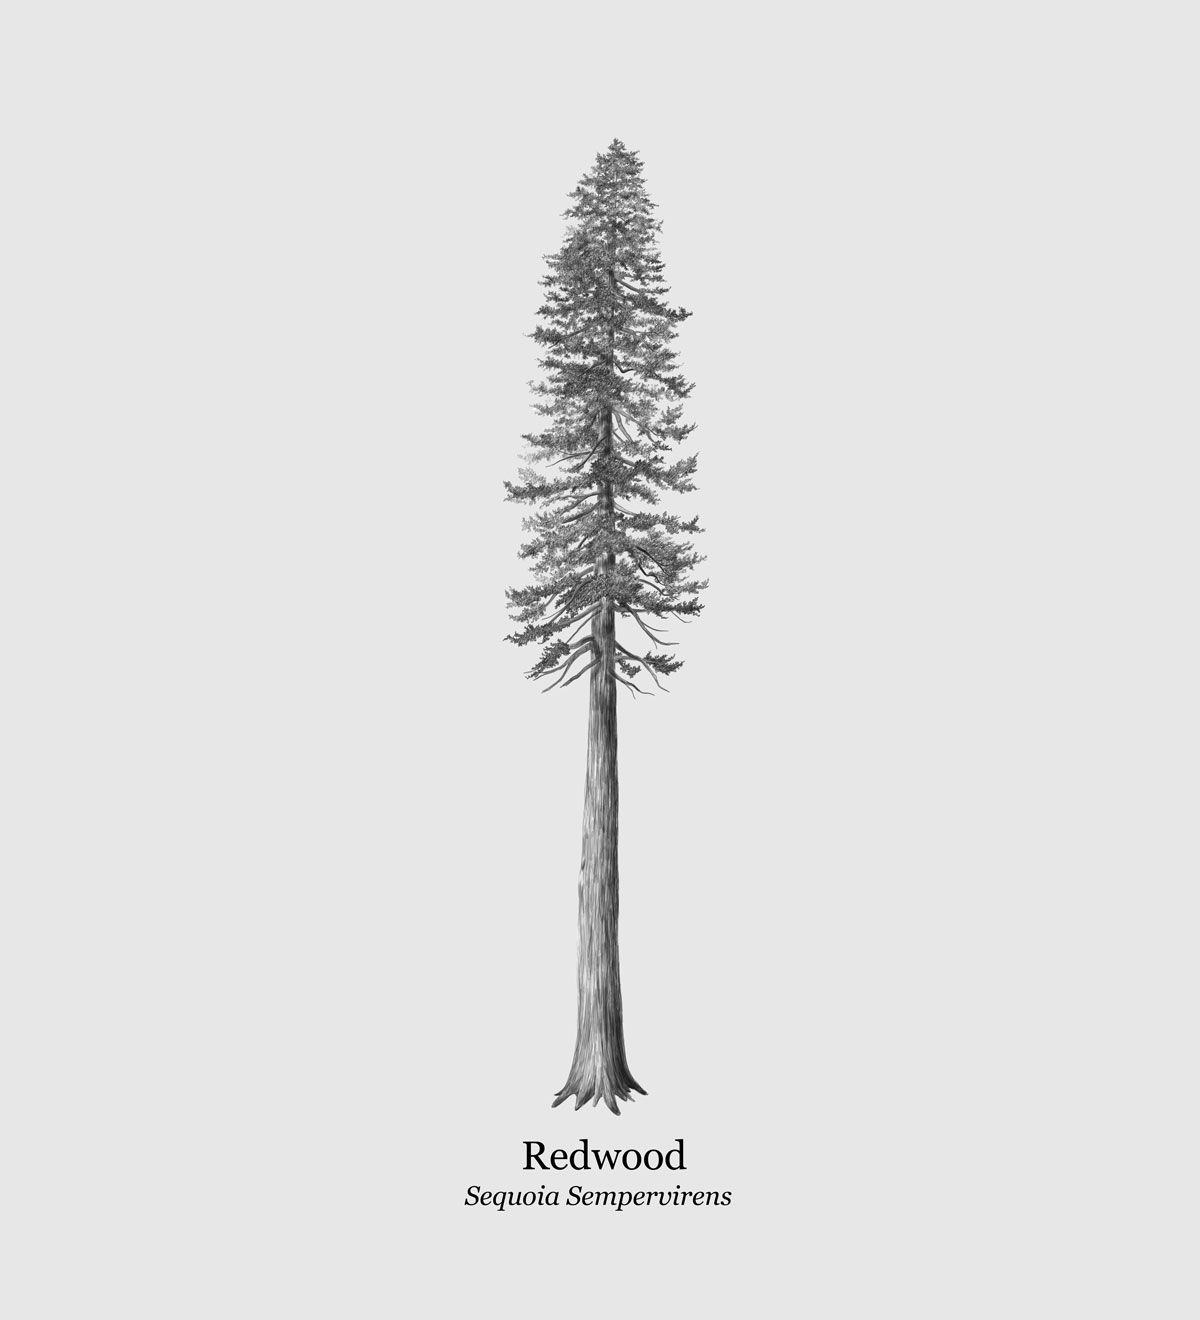 Redwood Tree Drawing Giclée Print | Etsy